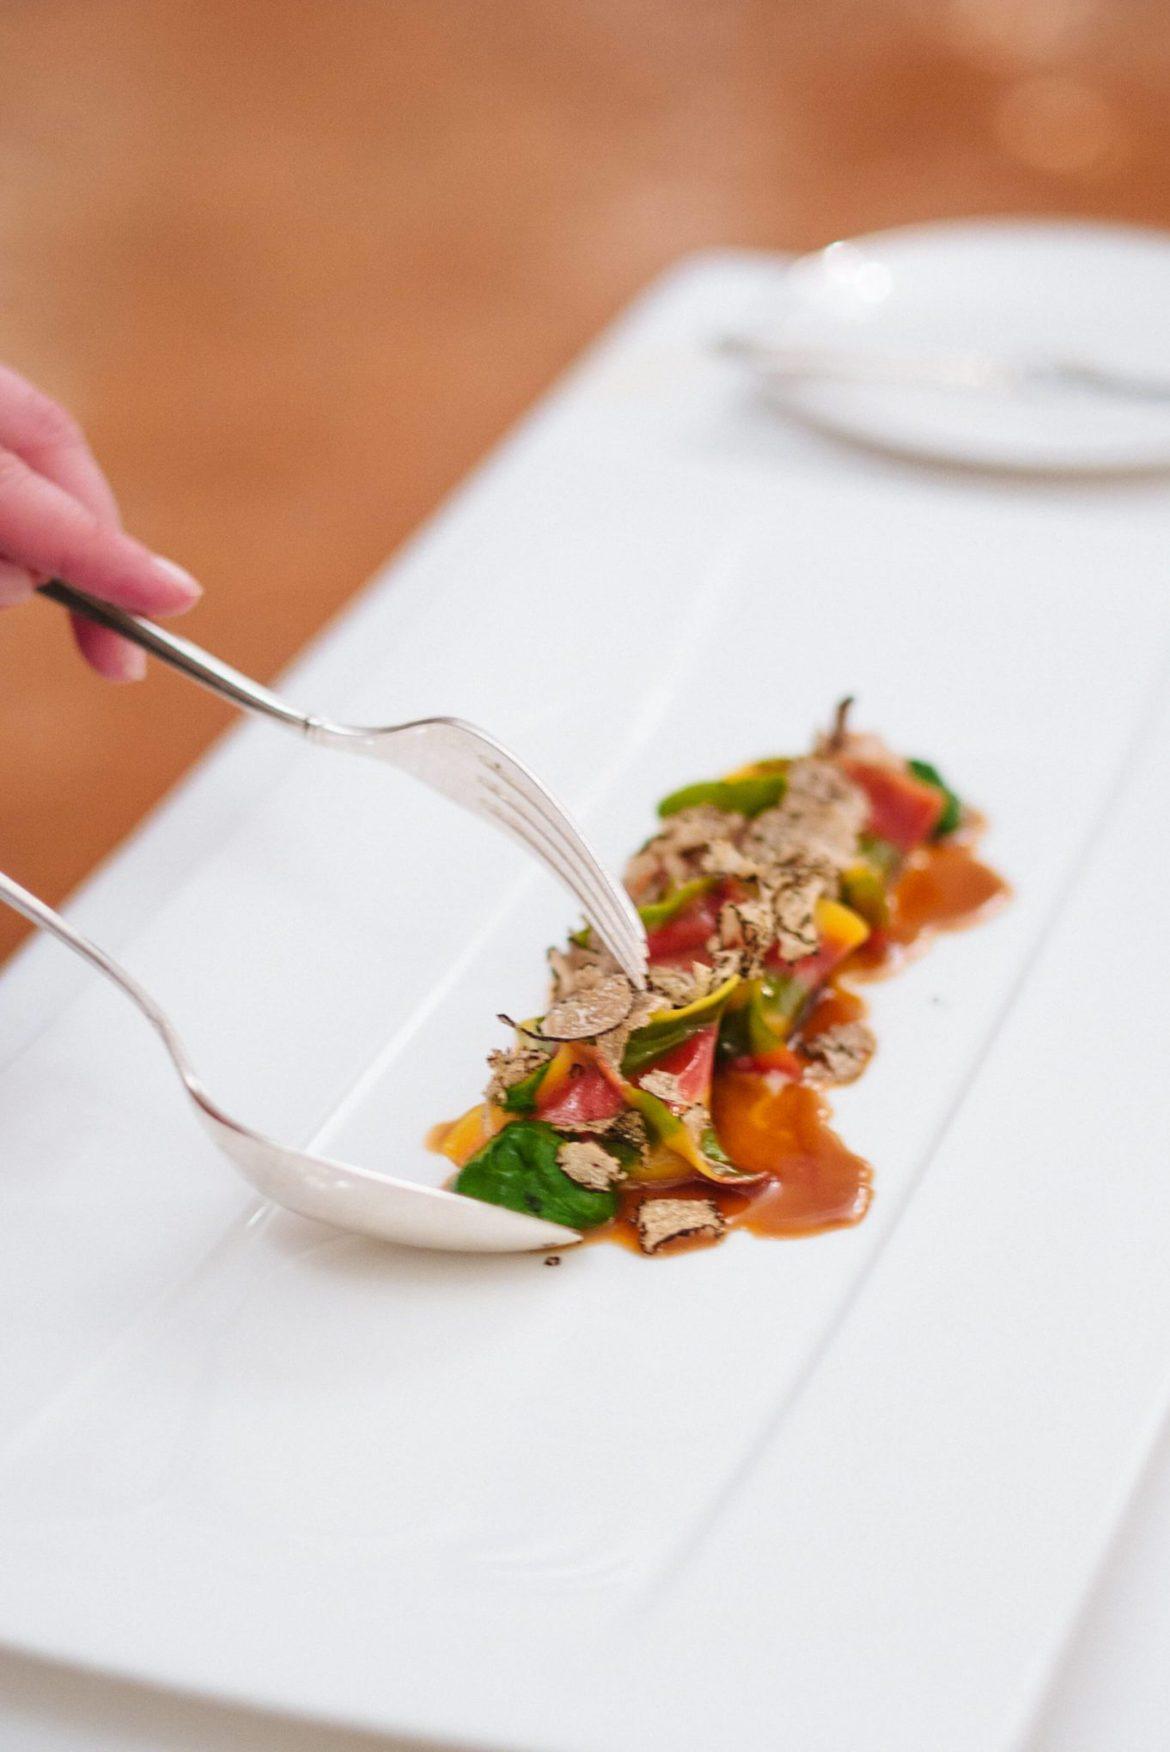 Wild Rabbit Ravioli at Rossellini's Restaurant in Palazzo Avino, Ravello Italy, The Taste Edit